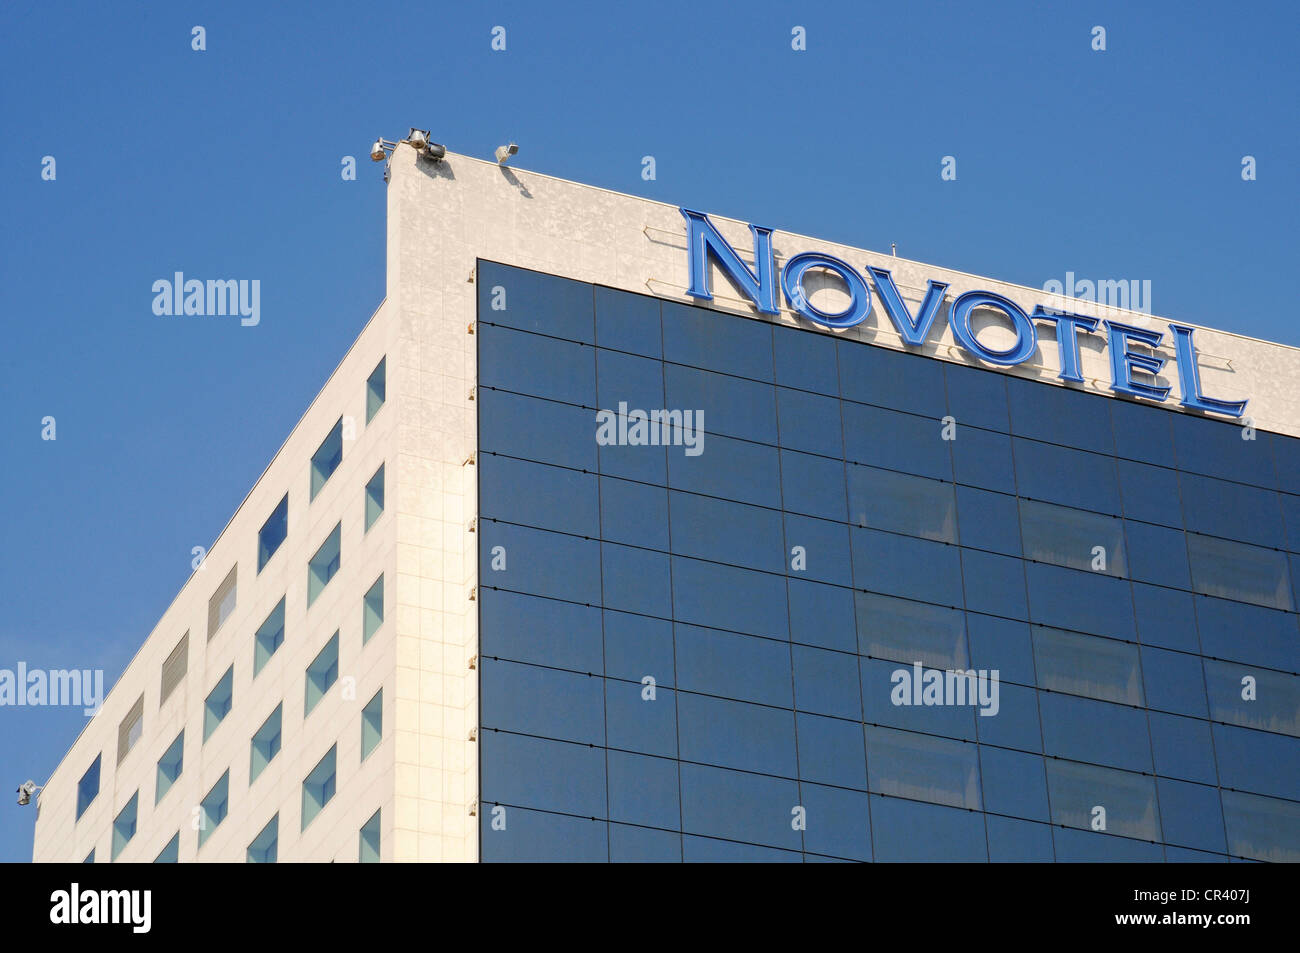 Novotel Hotel, multistorey building, Bucharest, Romania, Eastern Europe, Europe, PublicGround - Stock Image